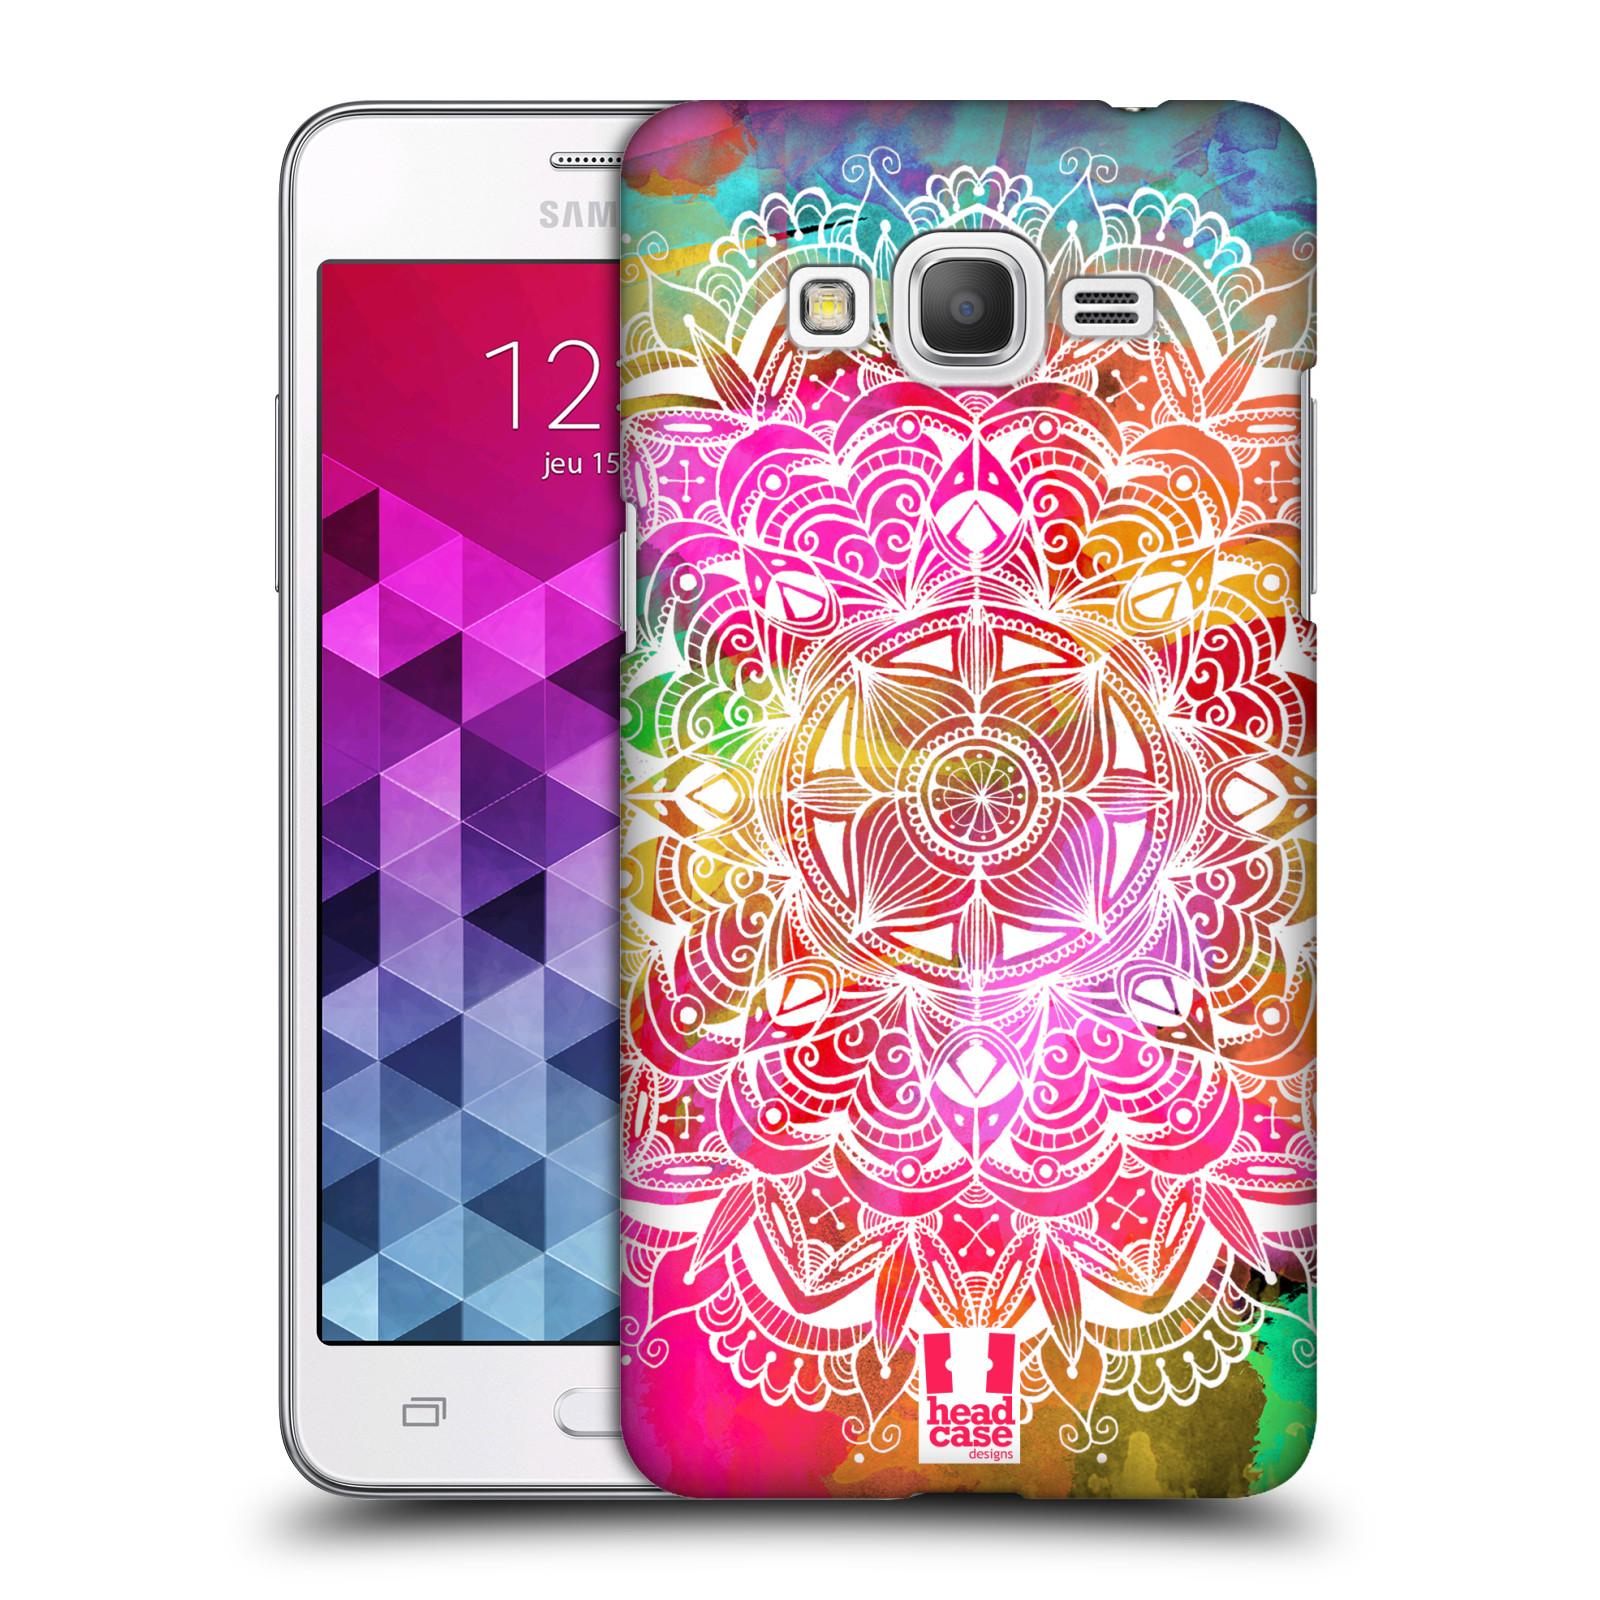 Dise os de caso mandala doodles head case para samsung galaxy grand prime 3g duos ebay - Grand mandala ...